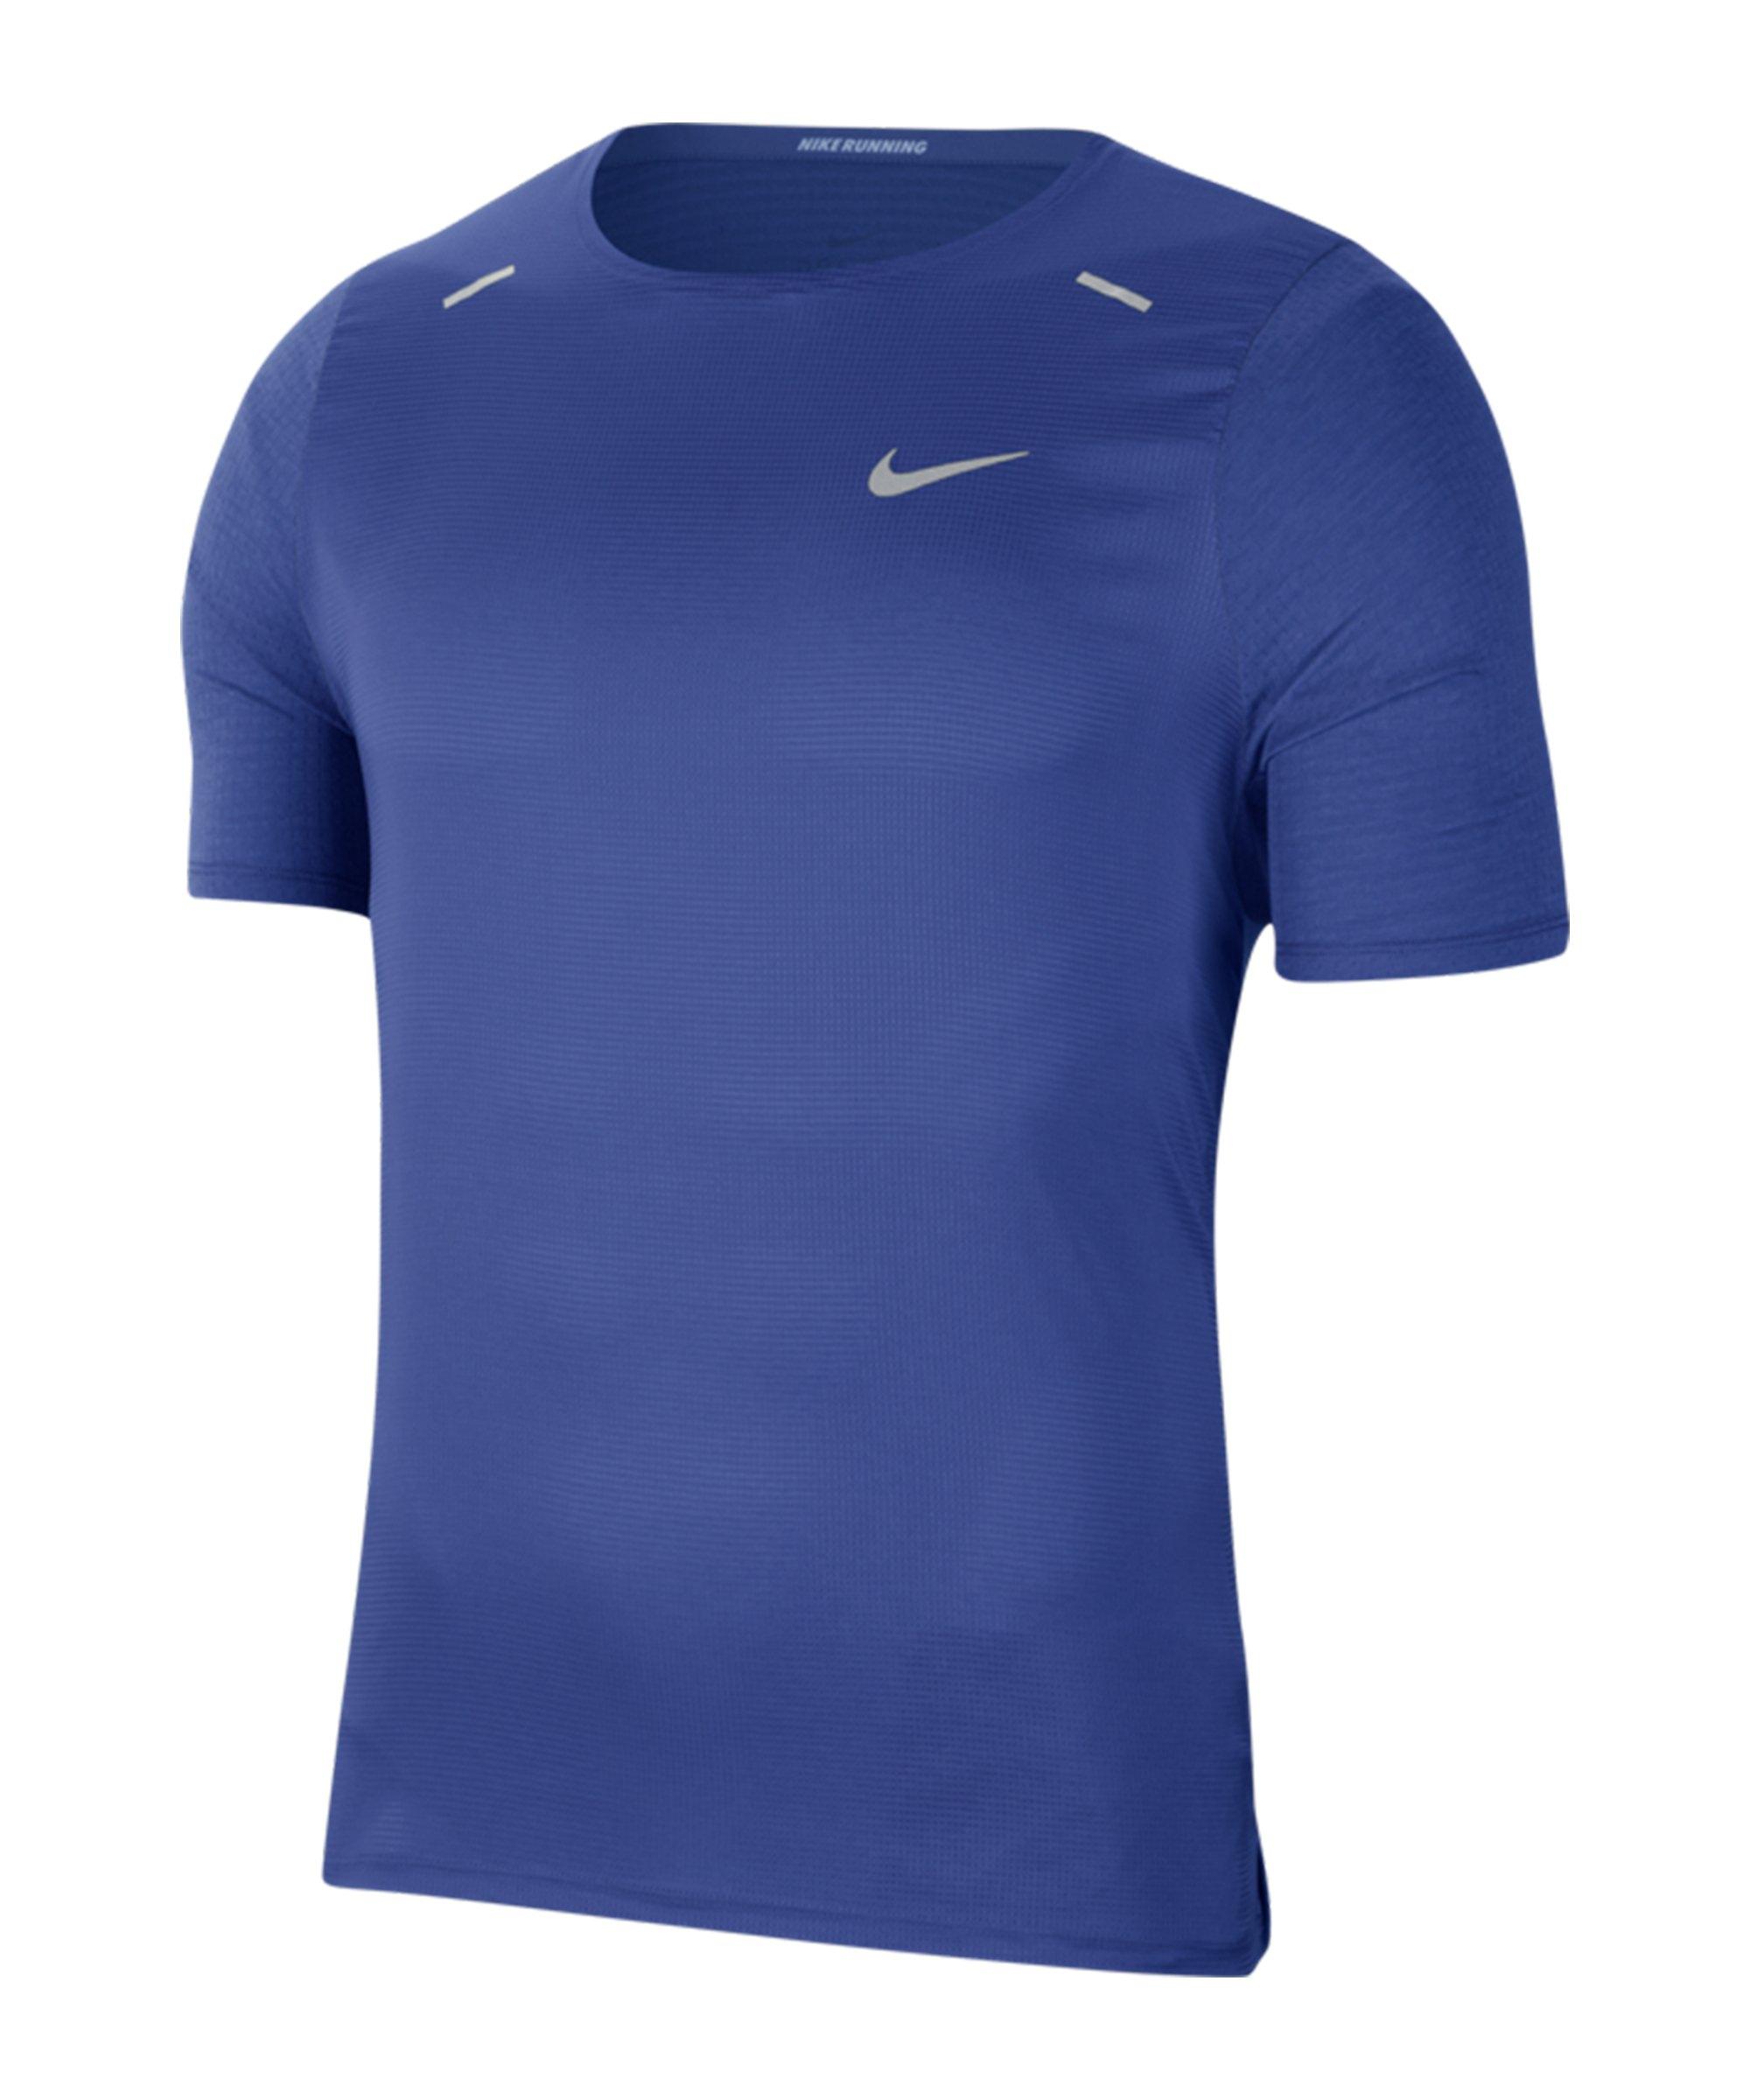 Nike Breathe Rise 365 T-Shirt Running Blau F430 - blau